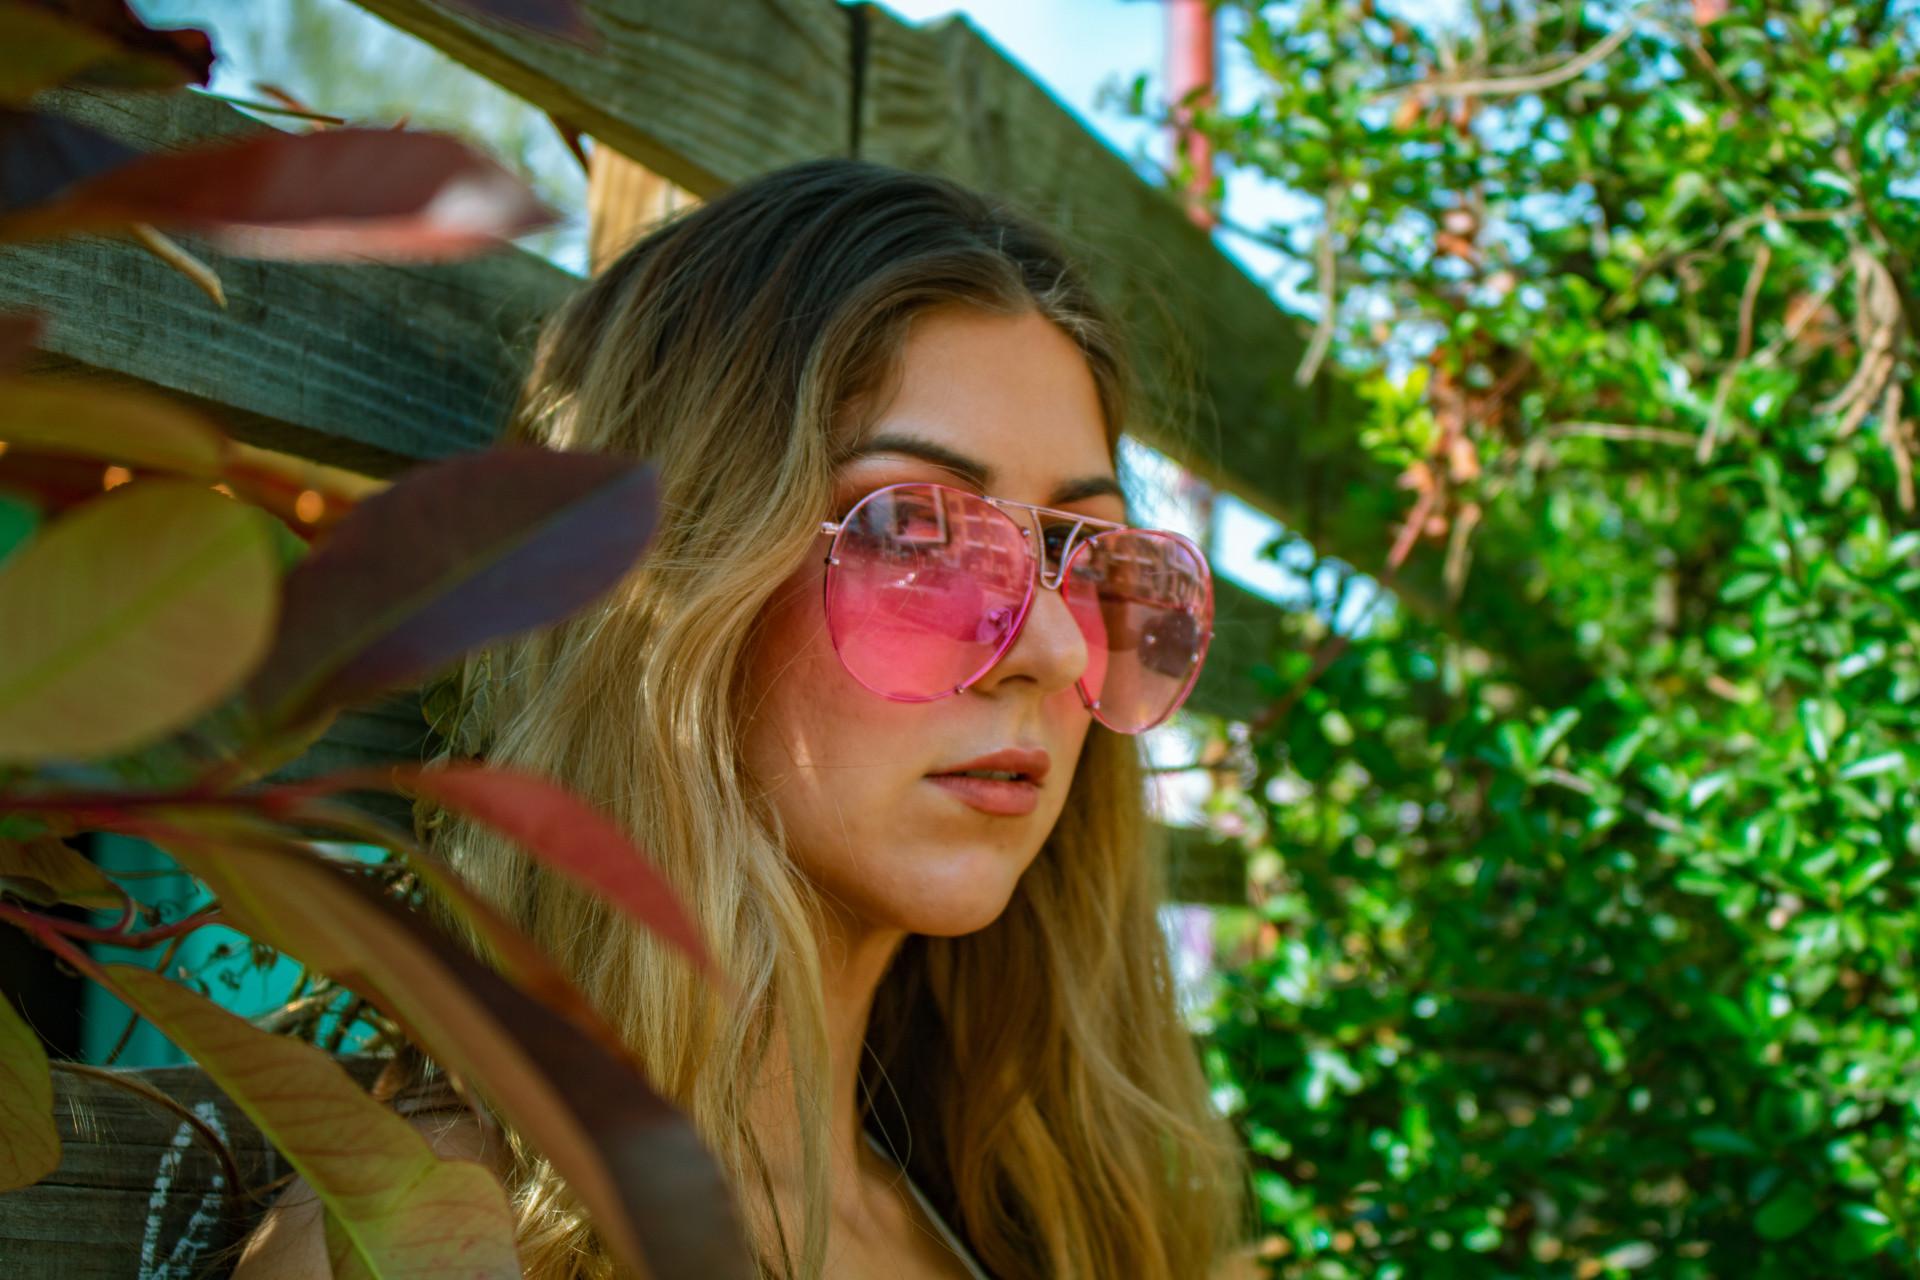 Model: Christina Austin, Texas